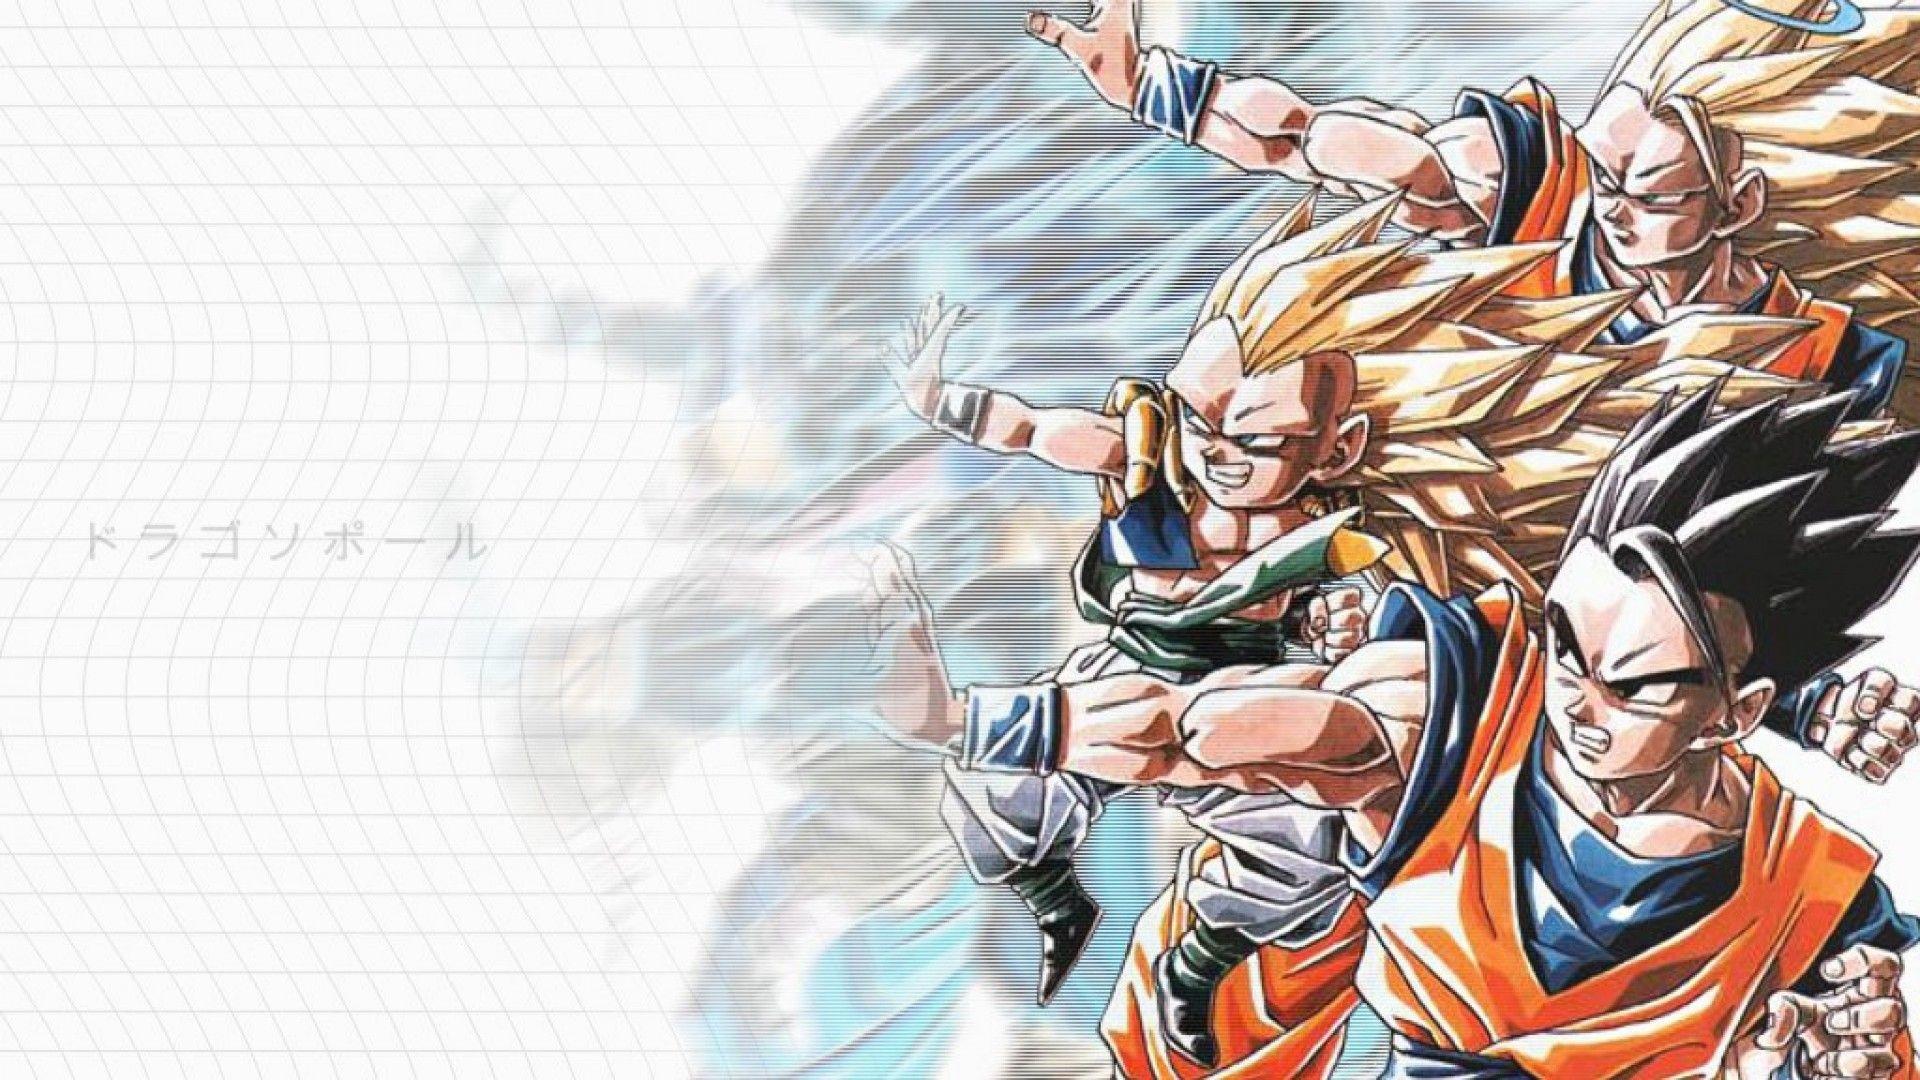 Dragon Ball Z HD Wallpapers – Wallpaper Cave